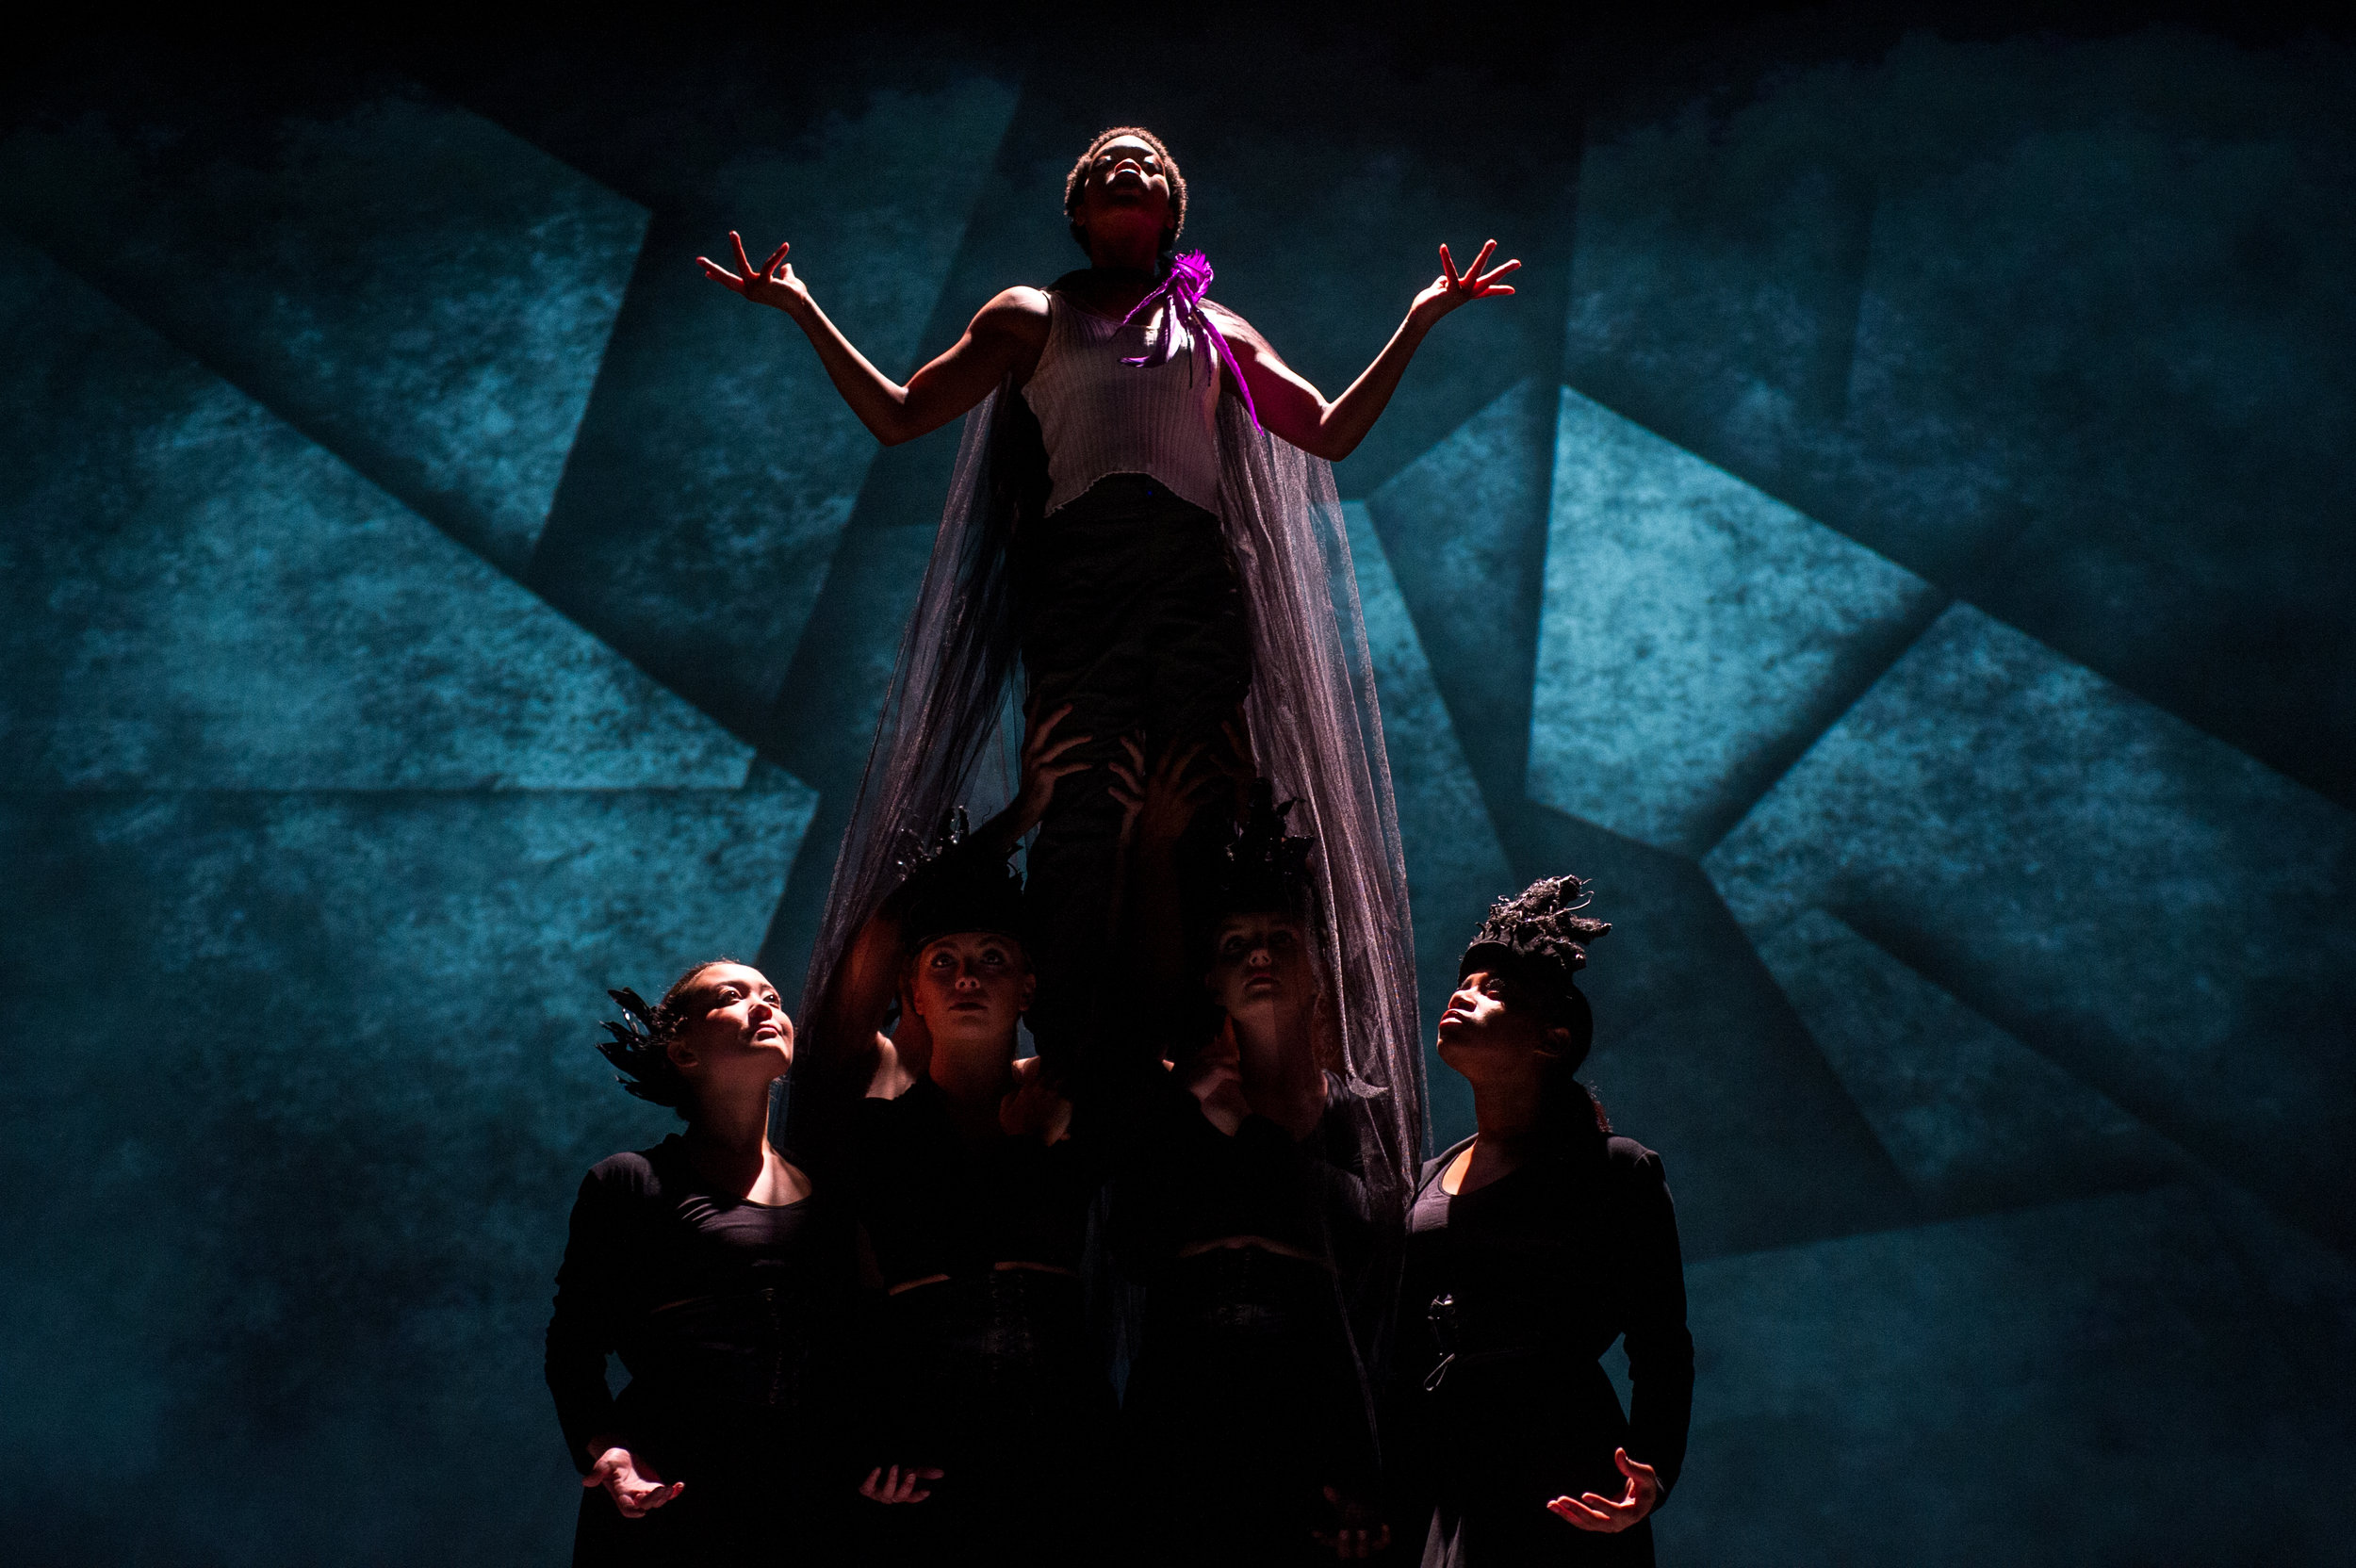 Dancers: Mario Ramirez,Khorii Tinson, Yuriko Roby, Anna Starr, Mackenzie Lawrence, Myrah Porter  Photo: Lawrence Peart, Courtesy of The University of Texas at Austin